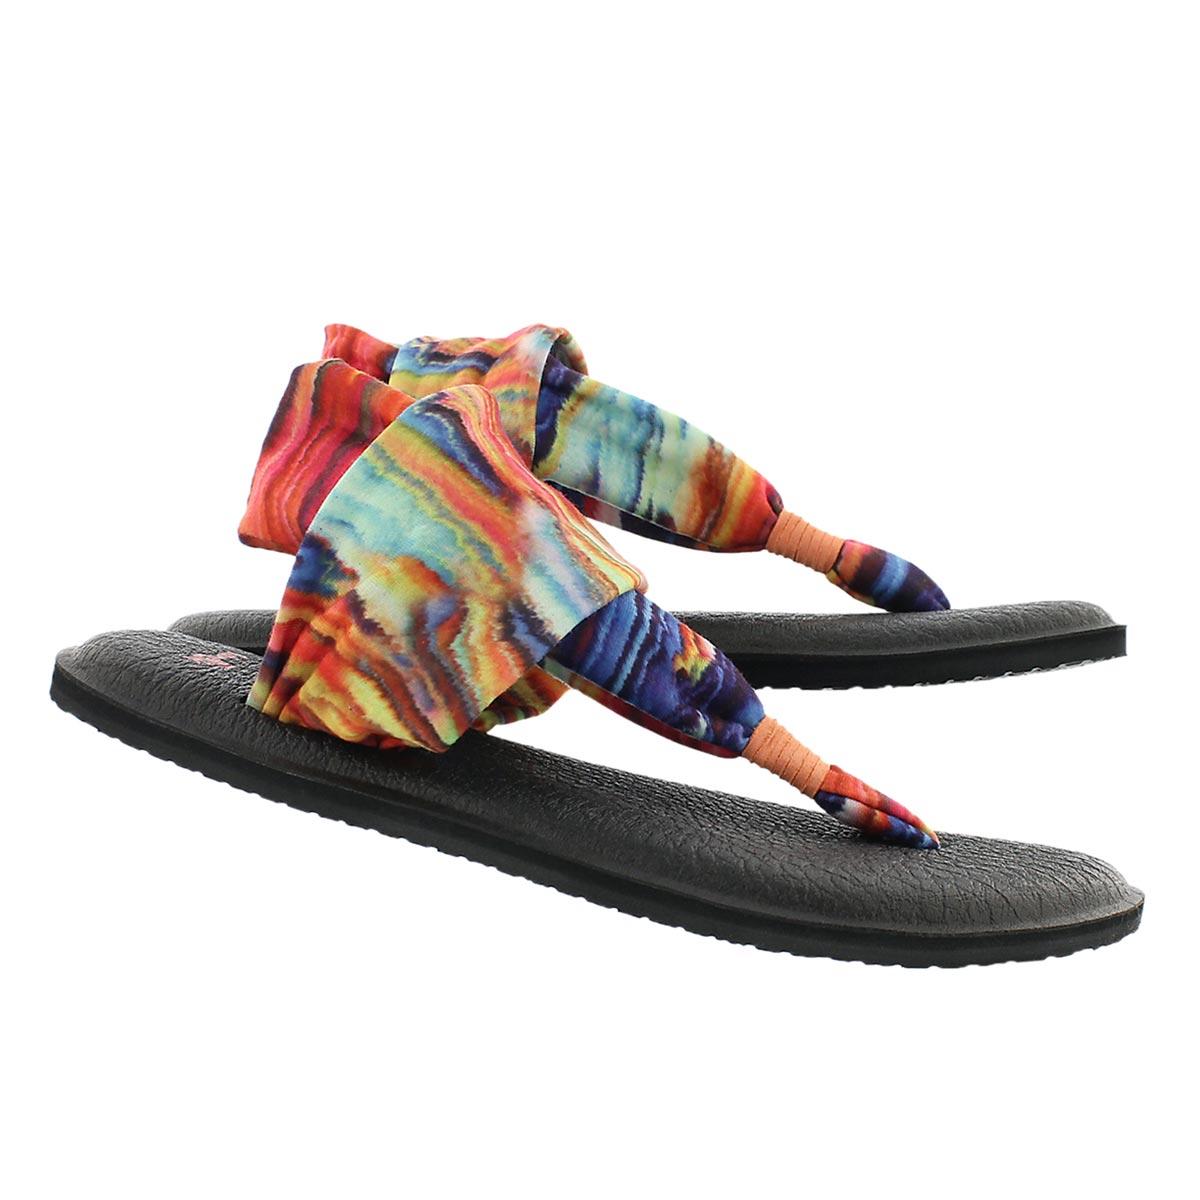 Lds Yoga Sling coral/multi print thong